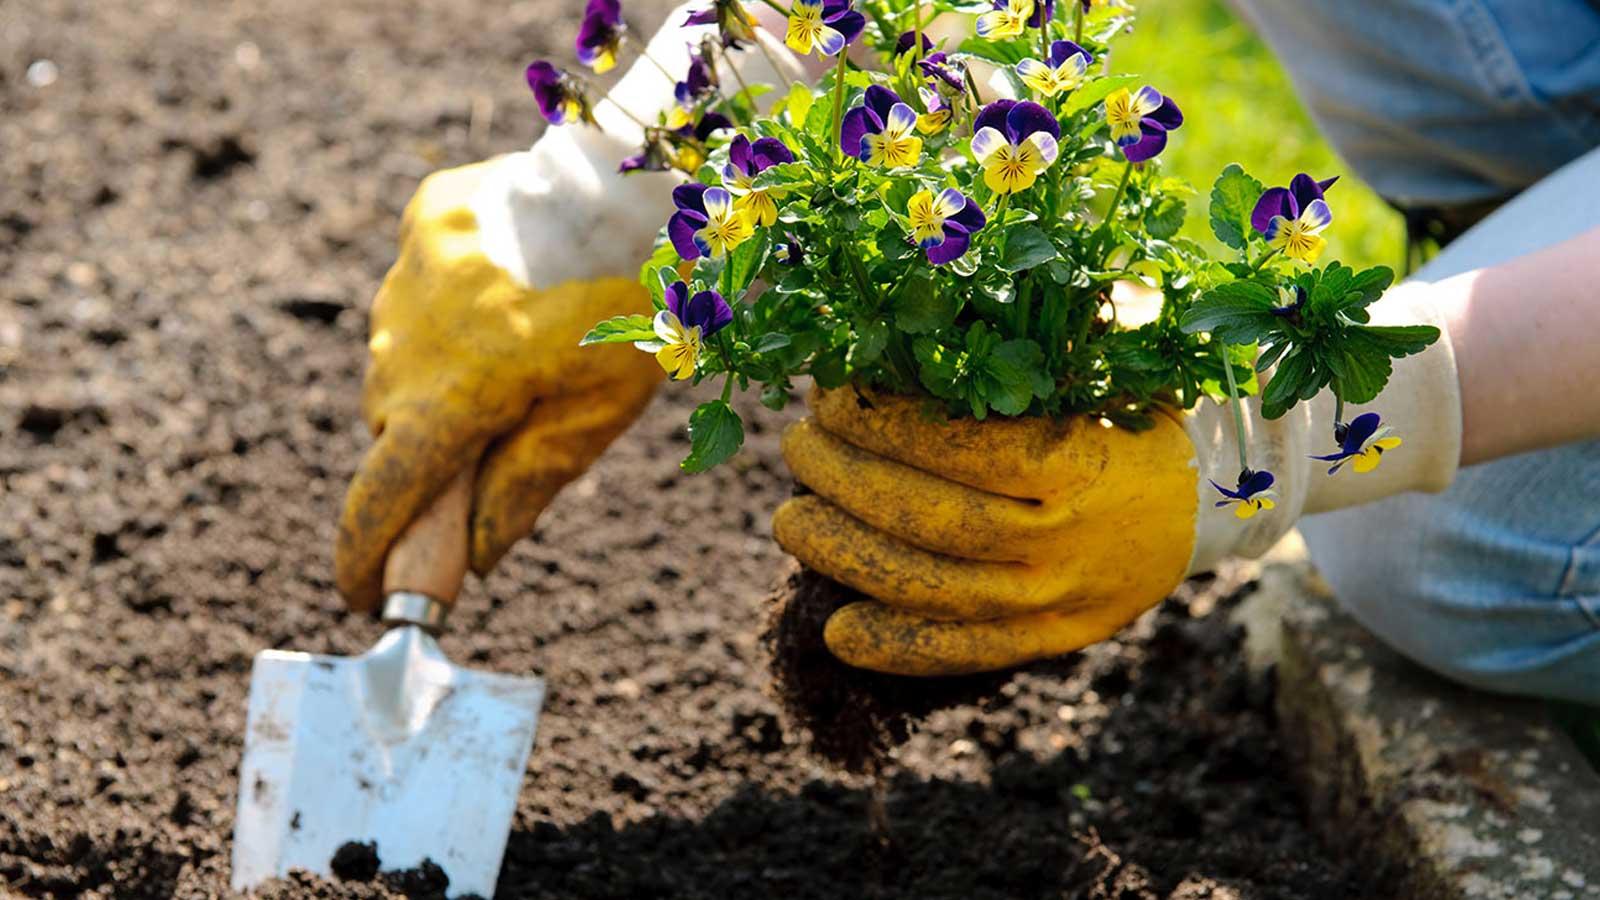 Veggie Gardening Tips